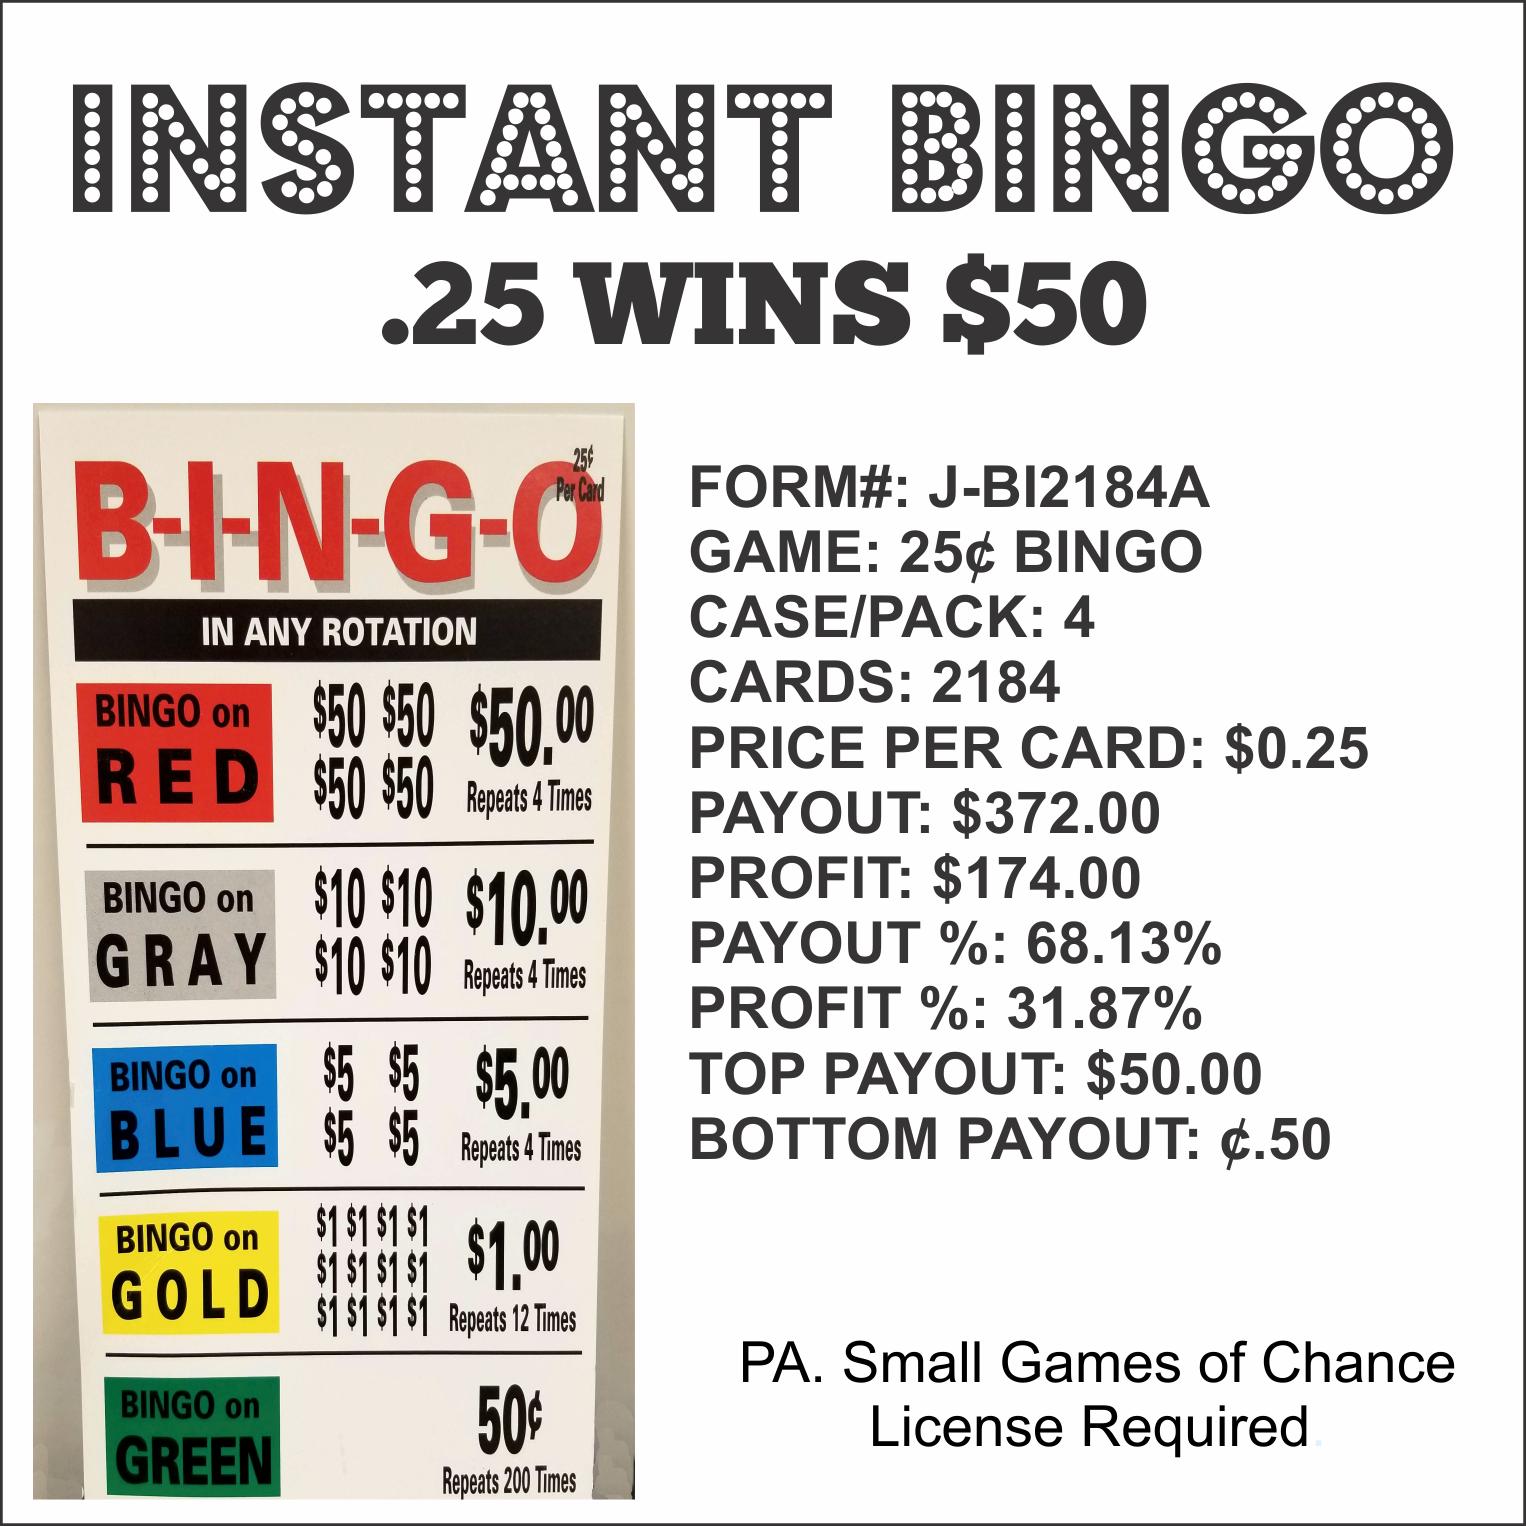 Instant Bingo .25 wins $50